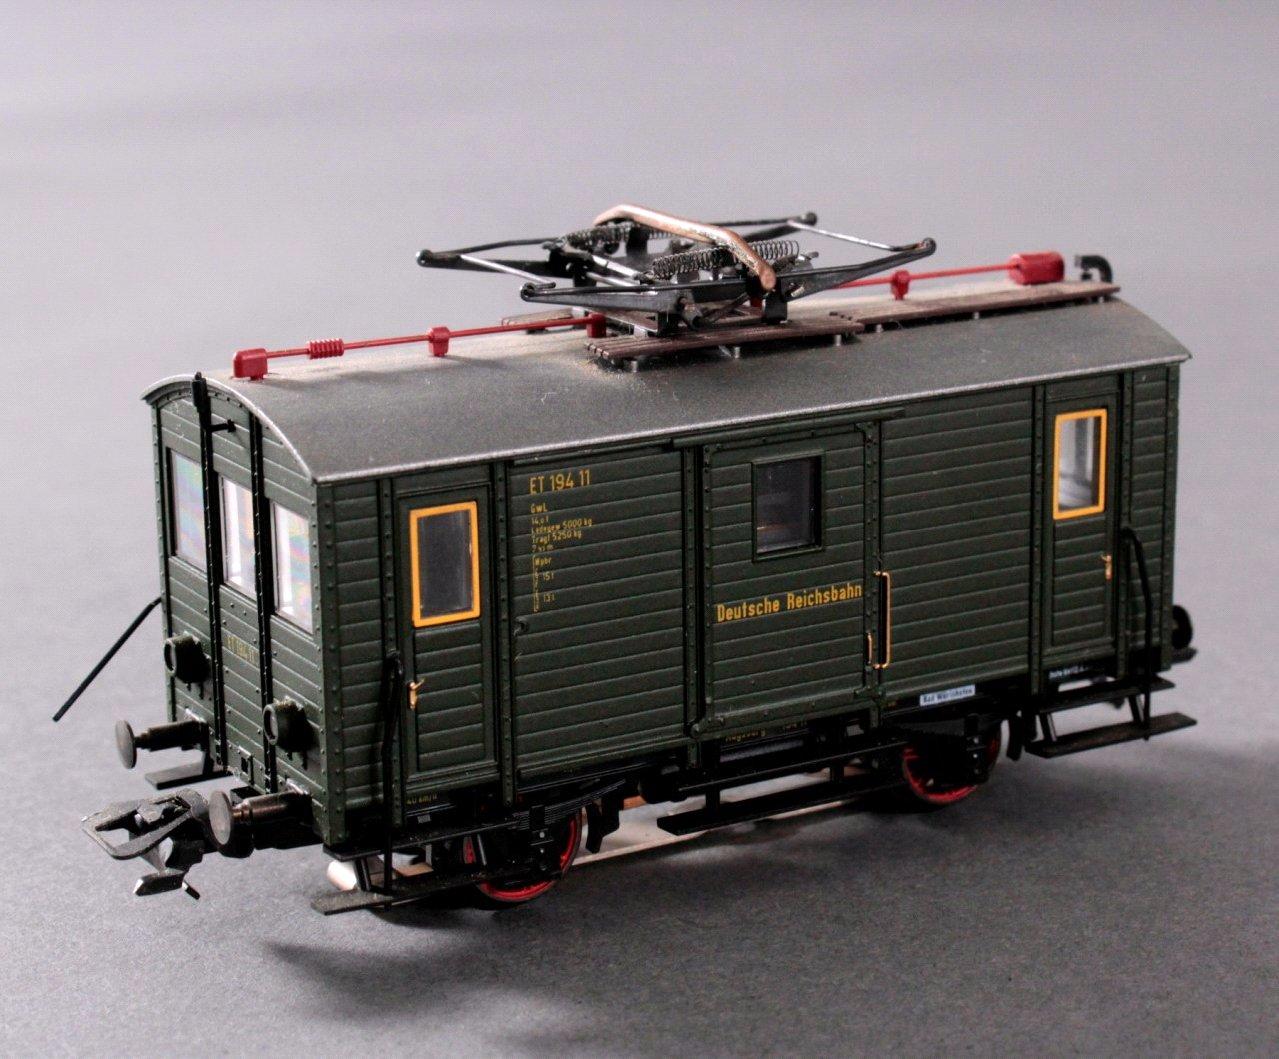 Märklin H0 3686 Gepäcktriebwagen ET 194 11 DRG grün mit-1